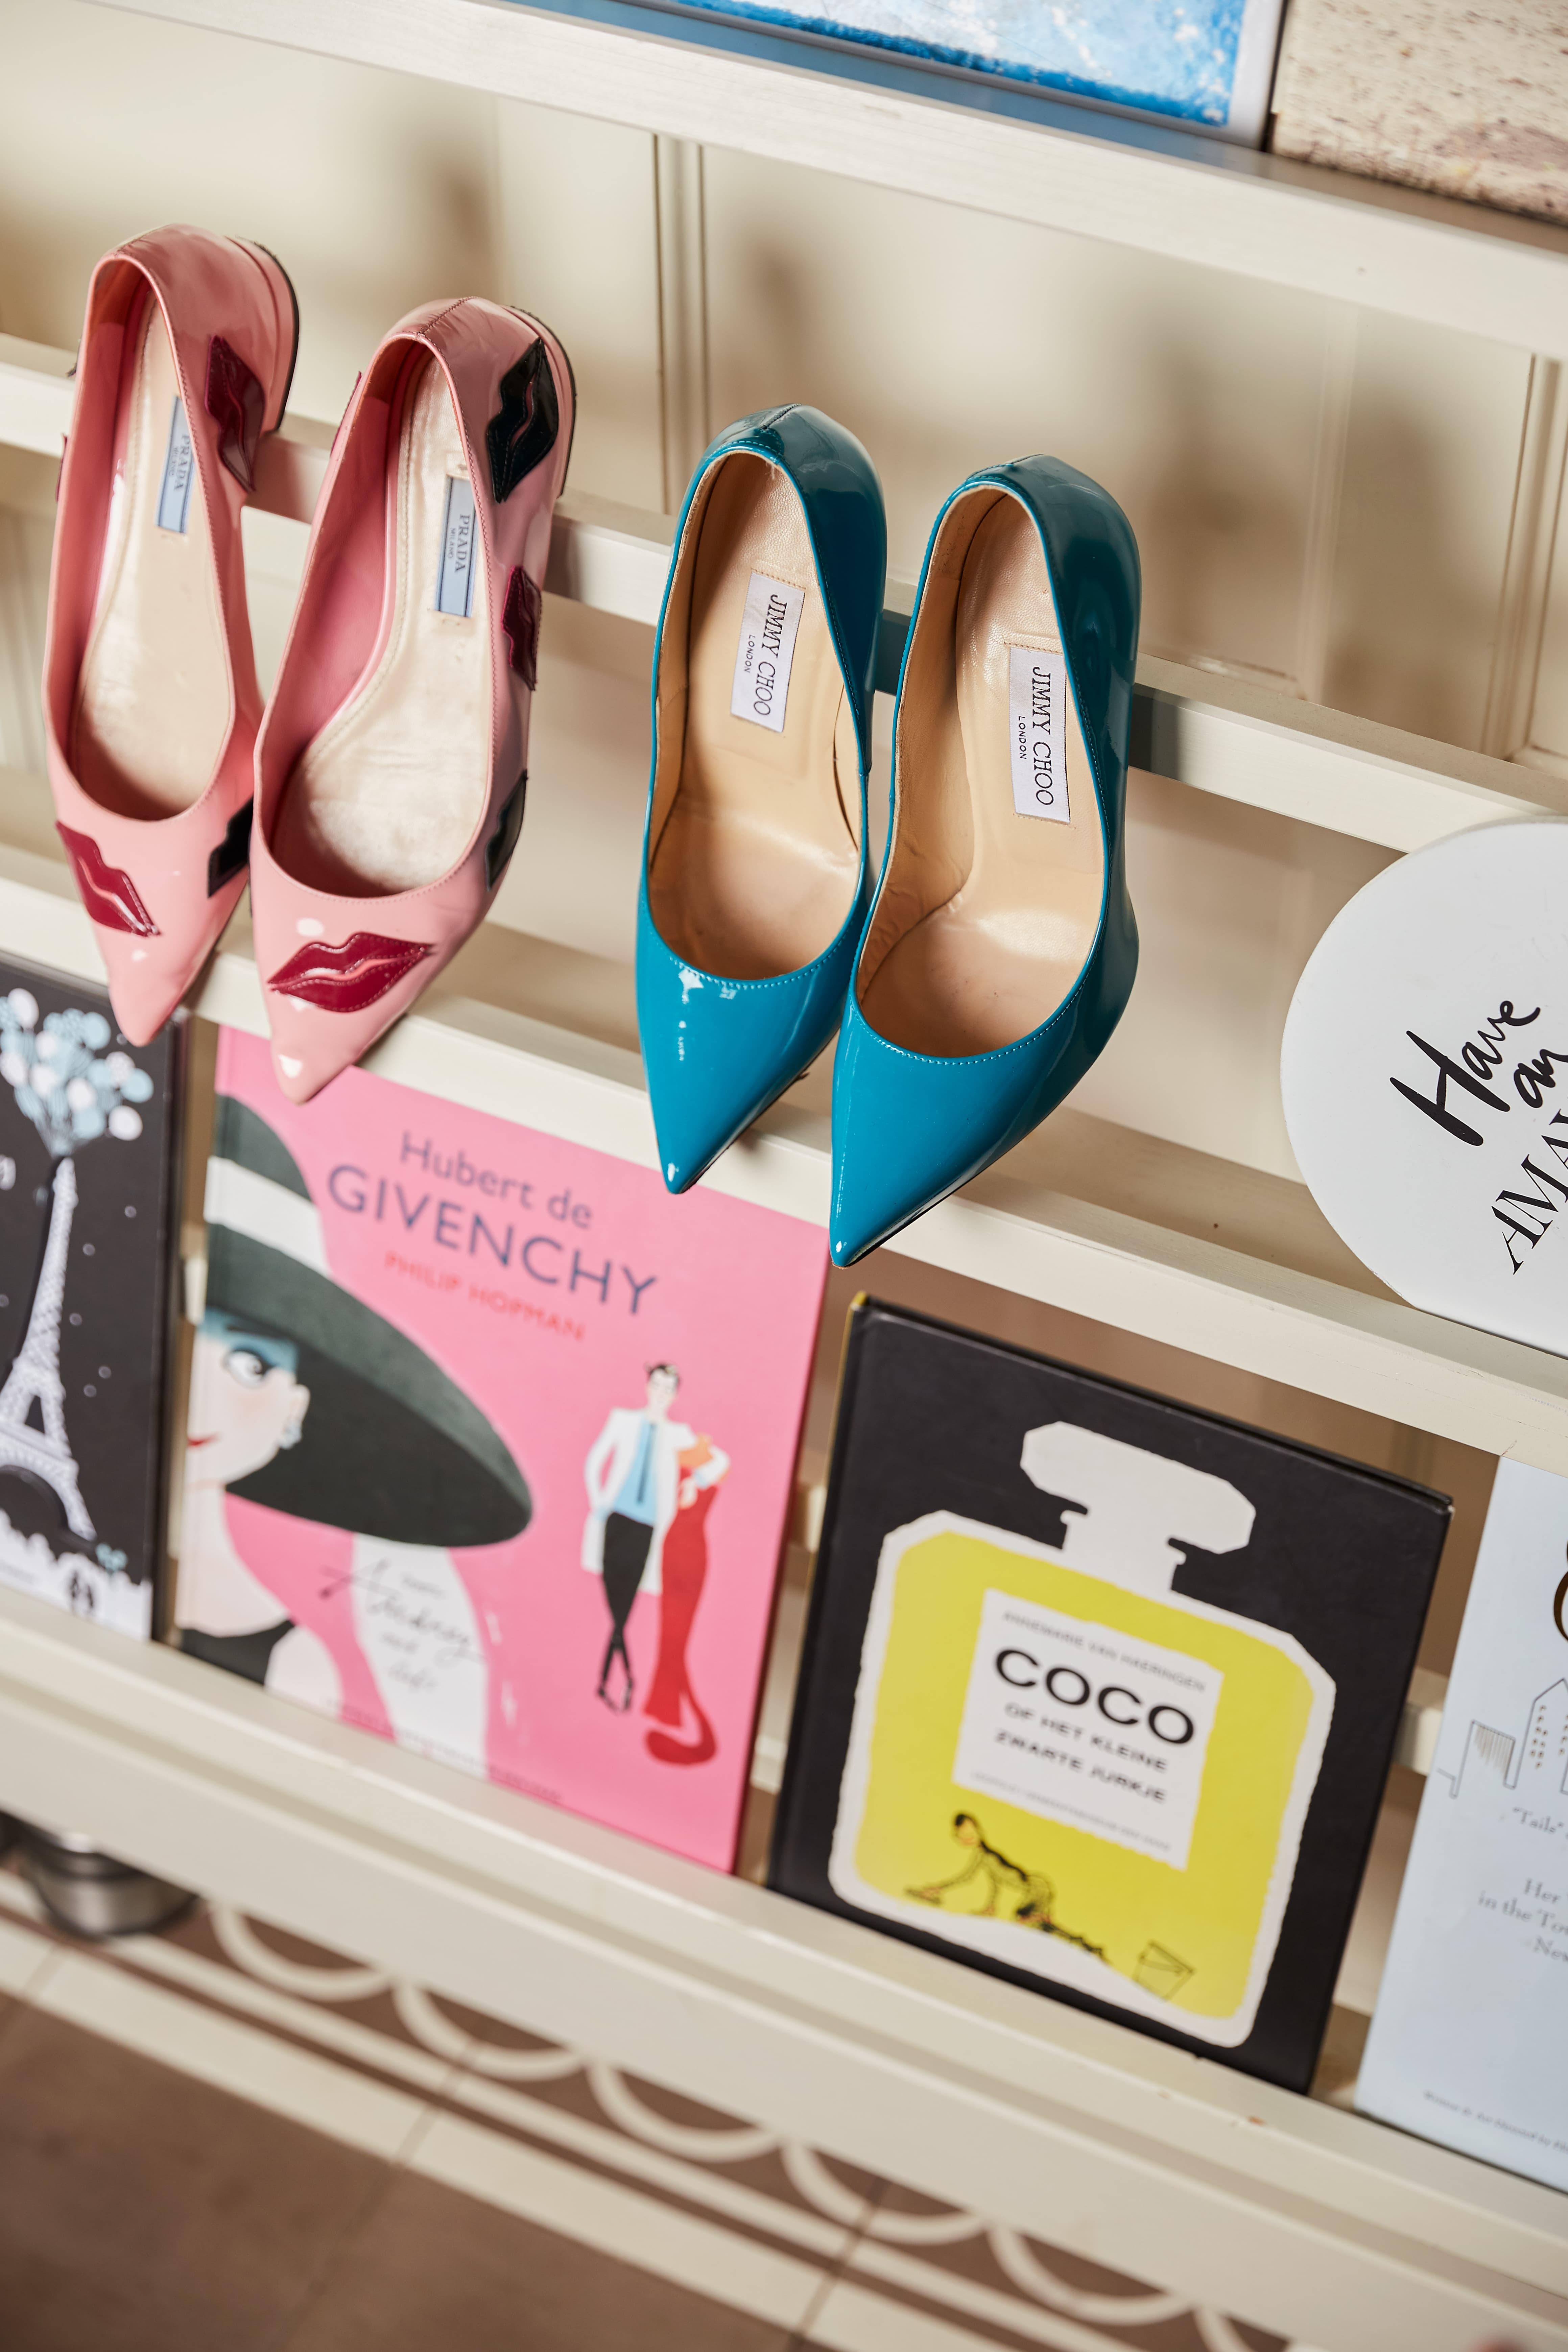 The Closet Of May-Britt Mobach 3